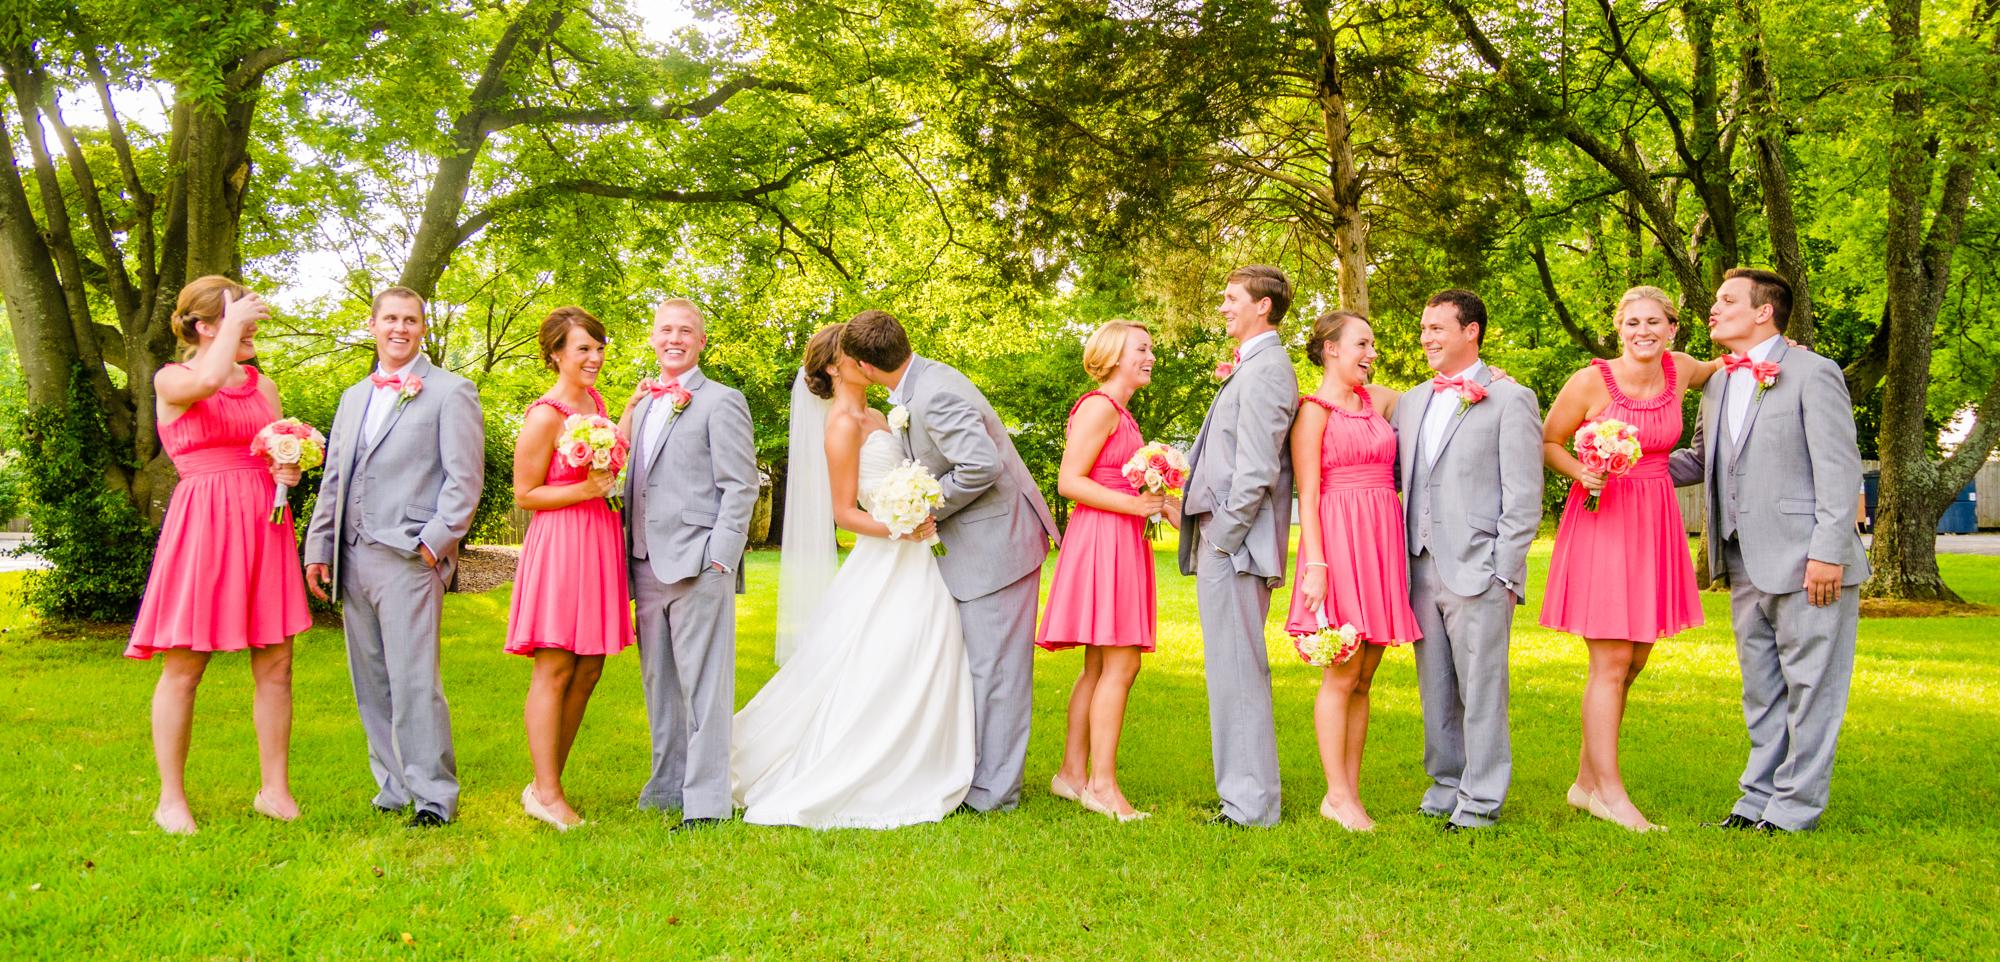 emily_brennan_bowling_green_ky_wedding-6906.jpg